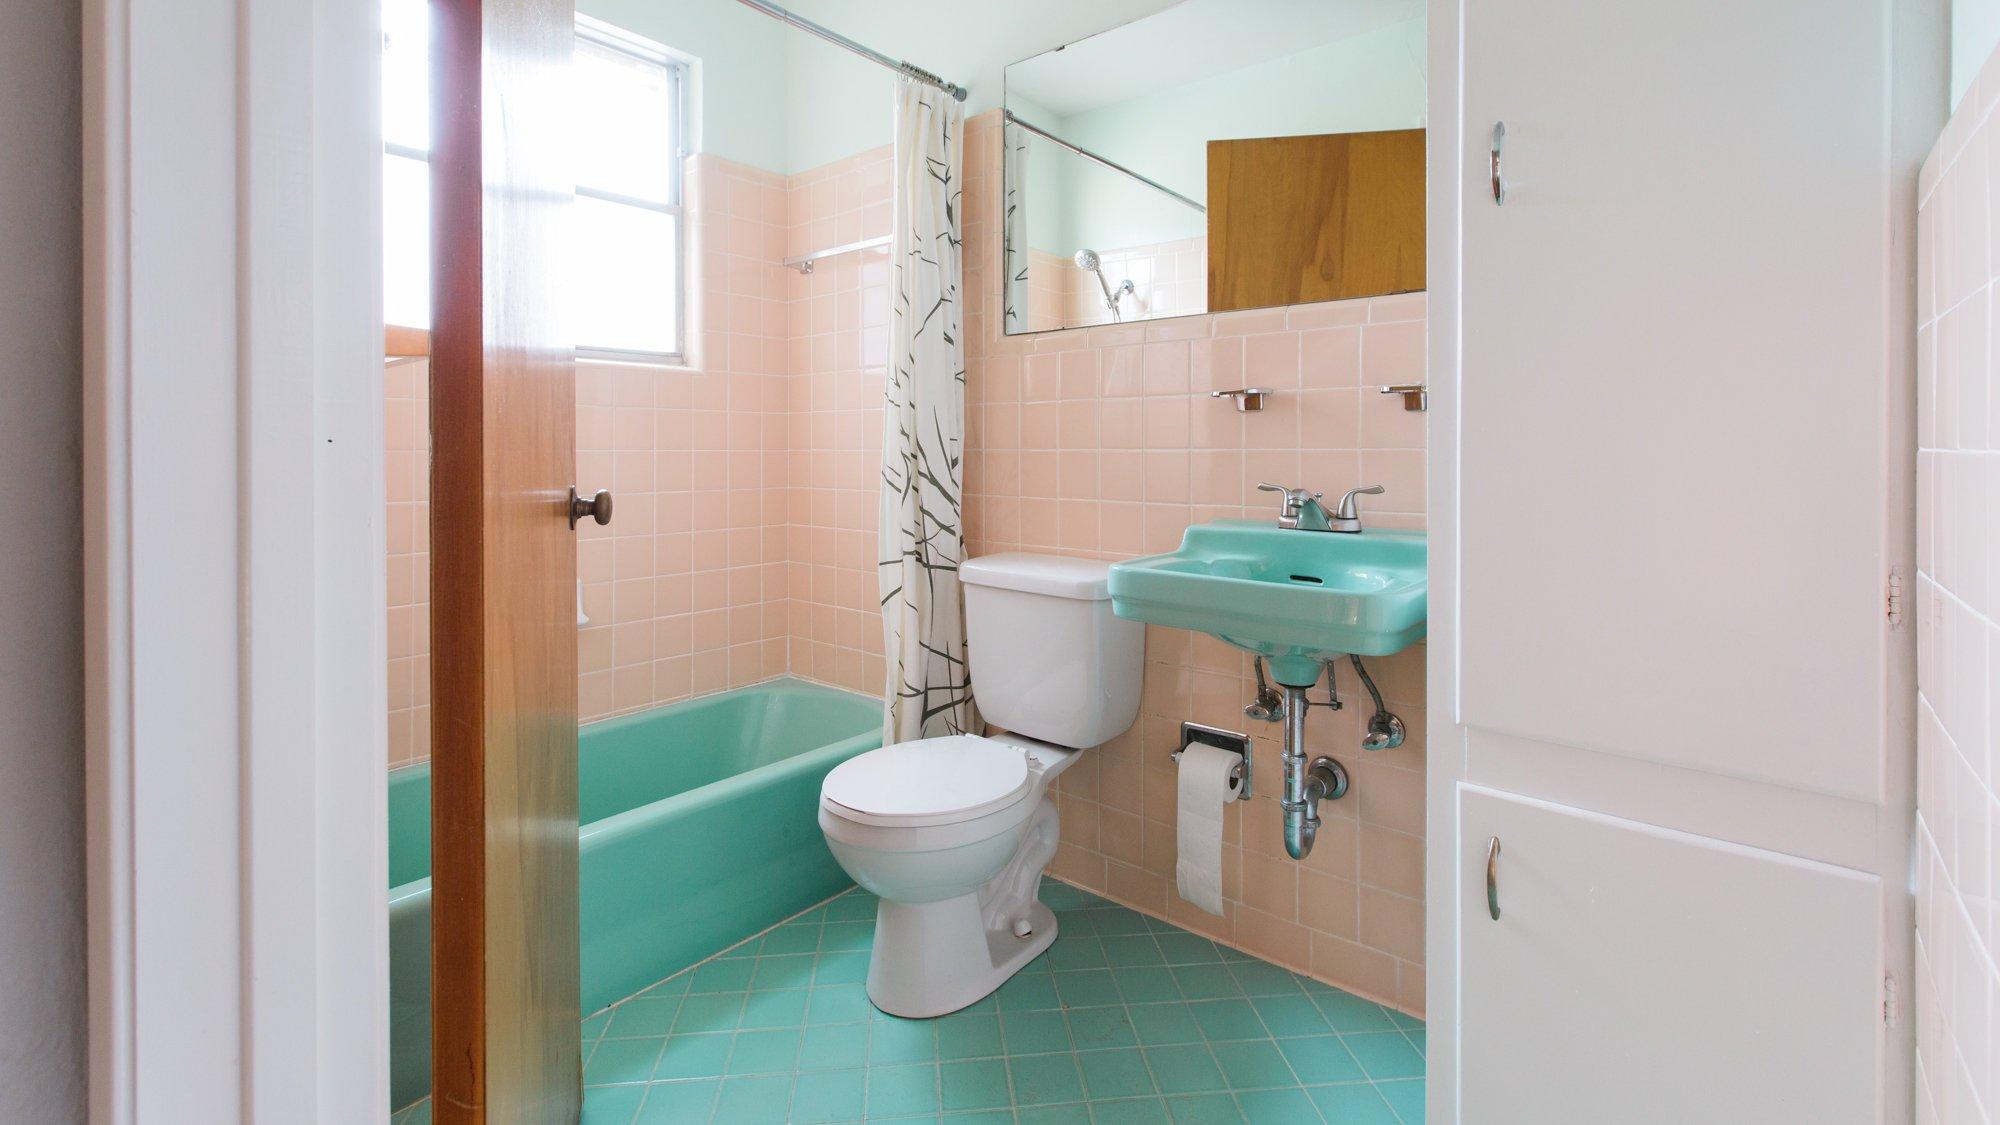 Love_Ding_Blog_Home_Renovation_Project_Vintage_Turquoise_Sink_Guest_Bathroom_Diana_Ascarrunz_Photography.jpg